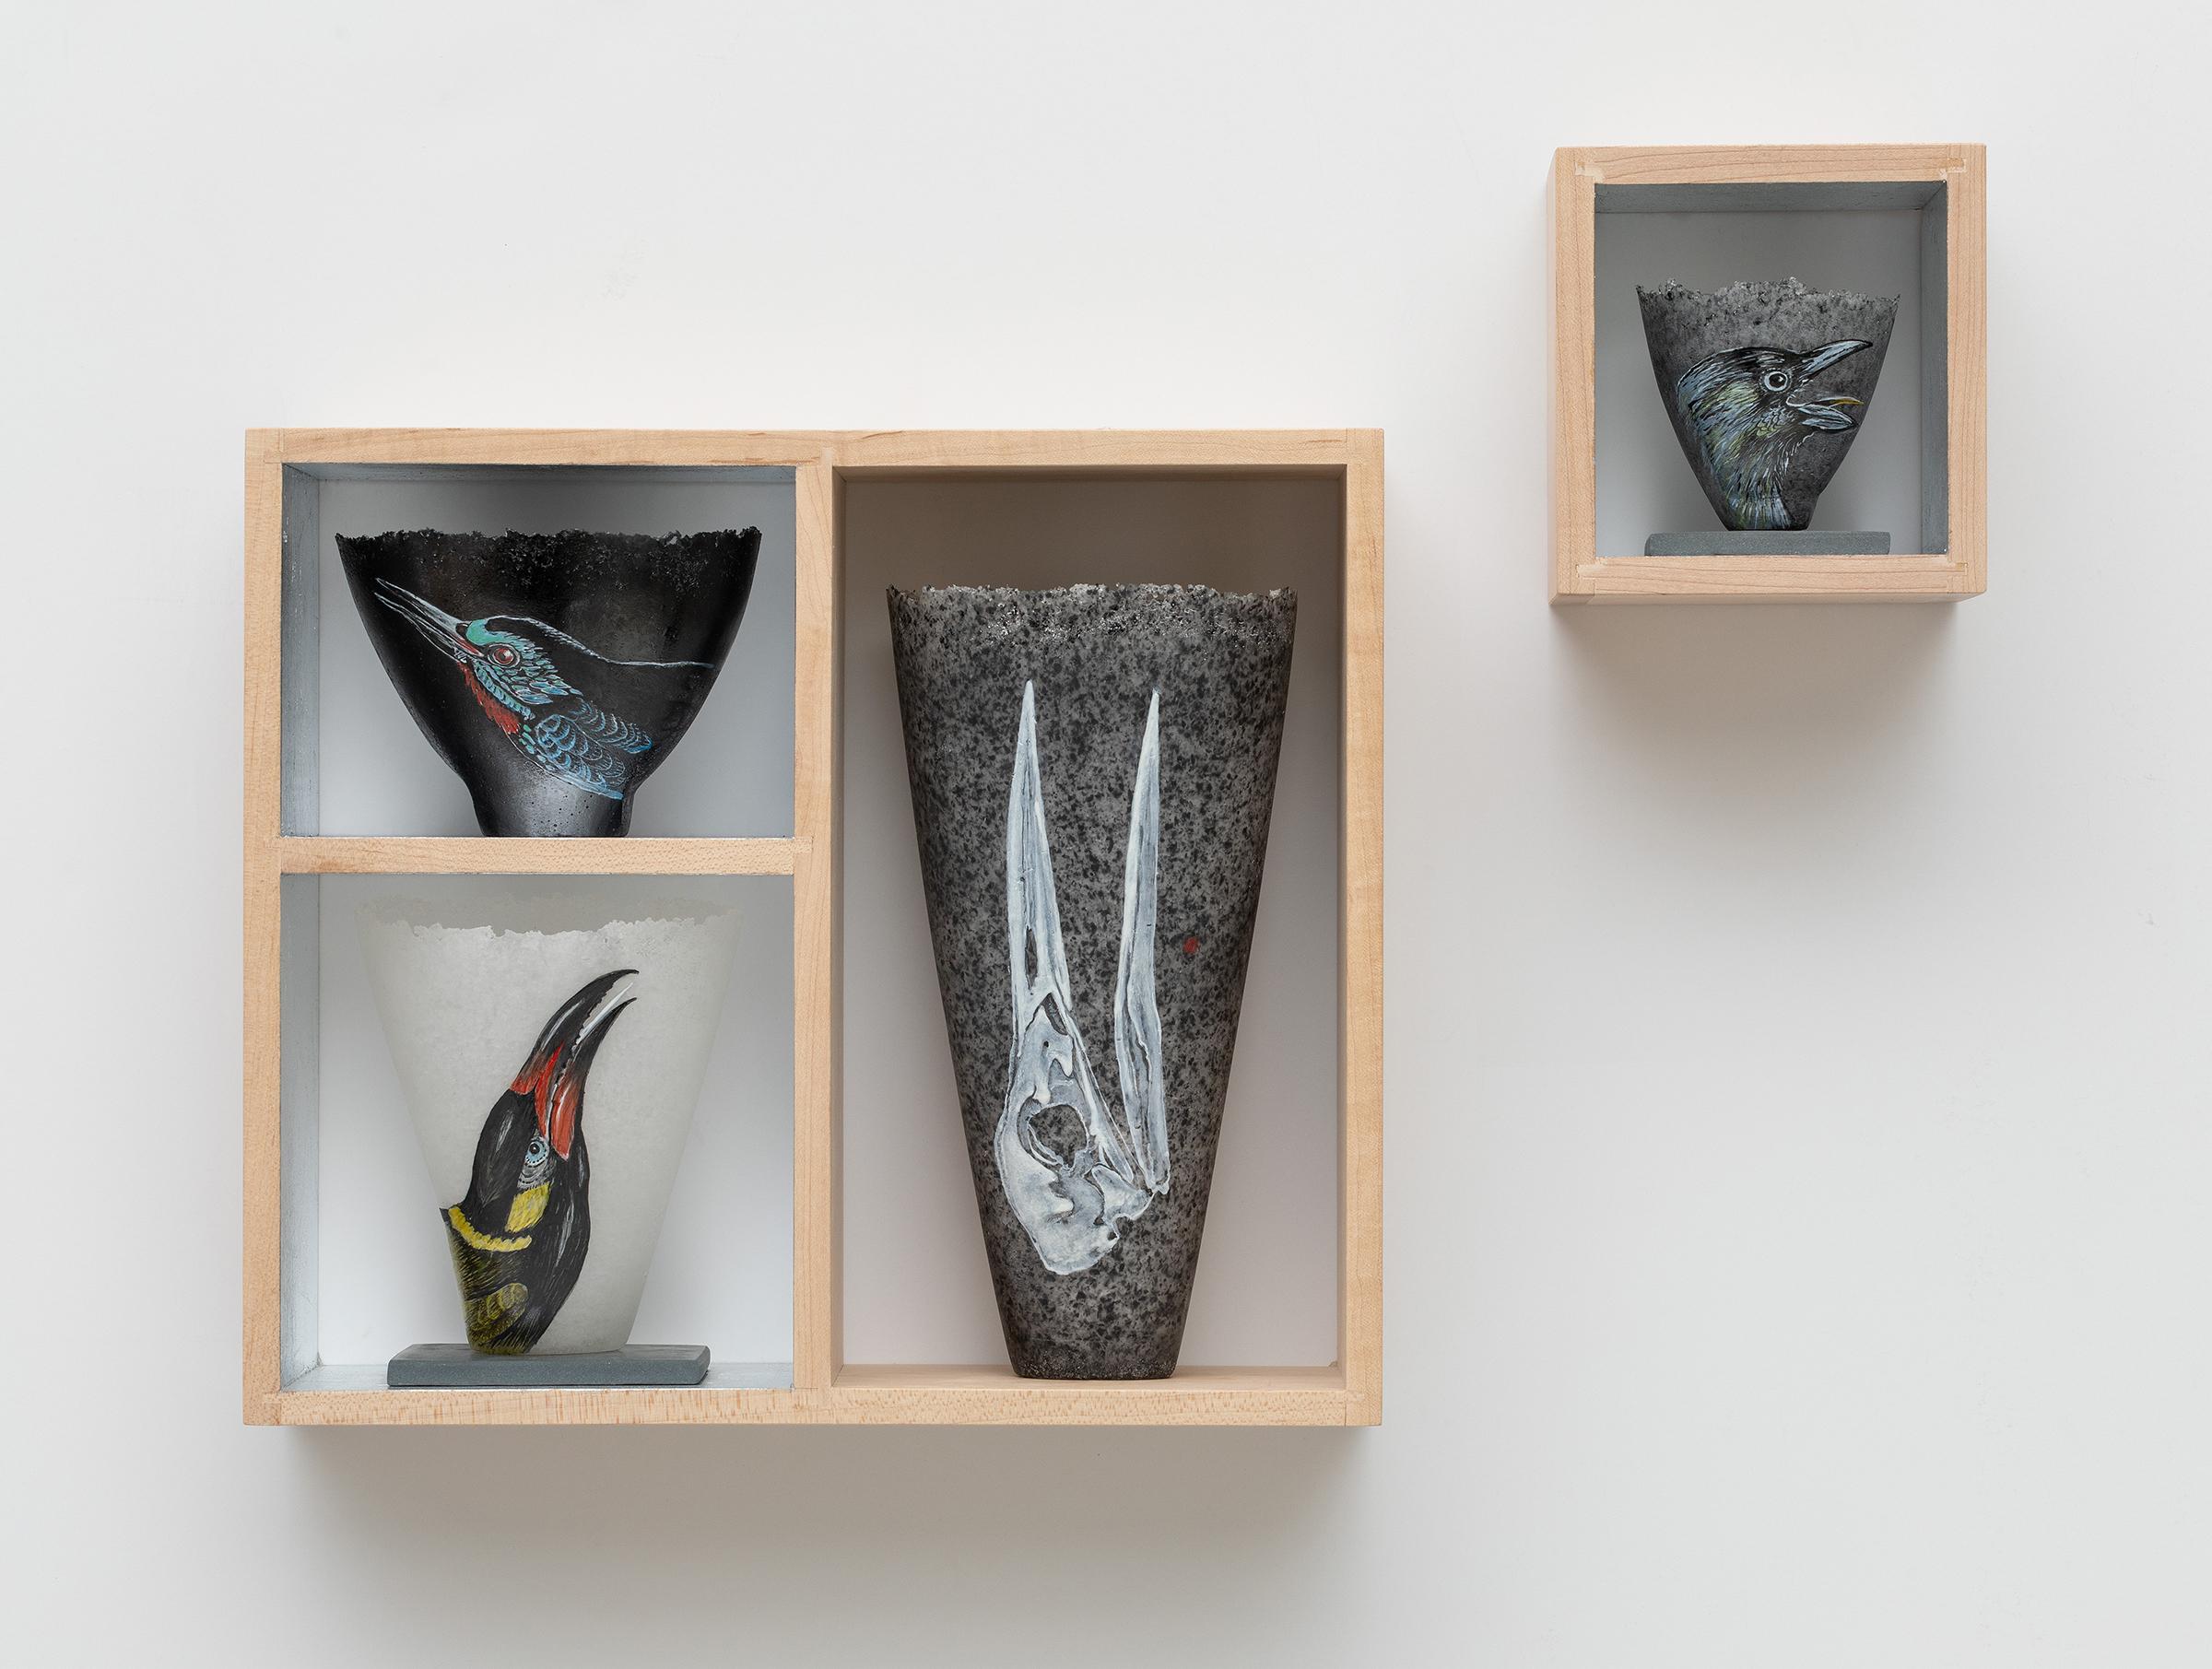 "Wailer , 2016-17 vitreous enamel on glass with wood 13.75 x 17.5 x 3.5"""